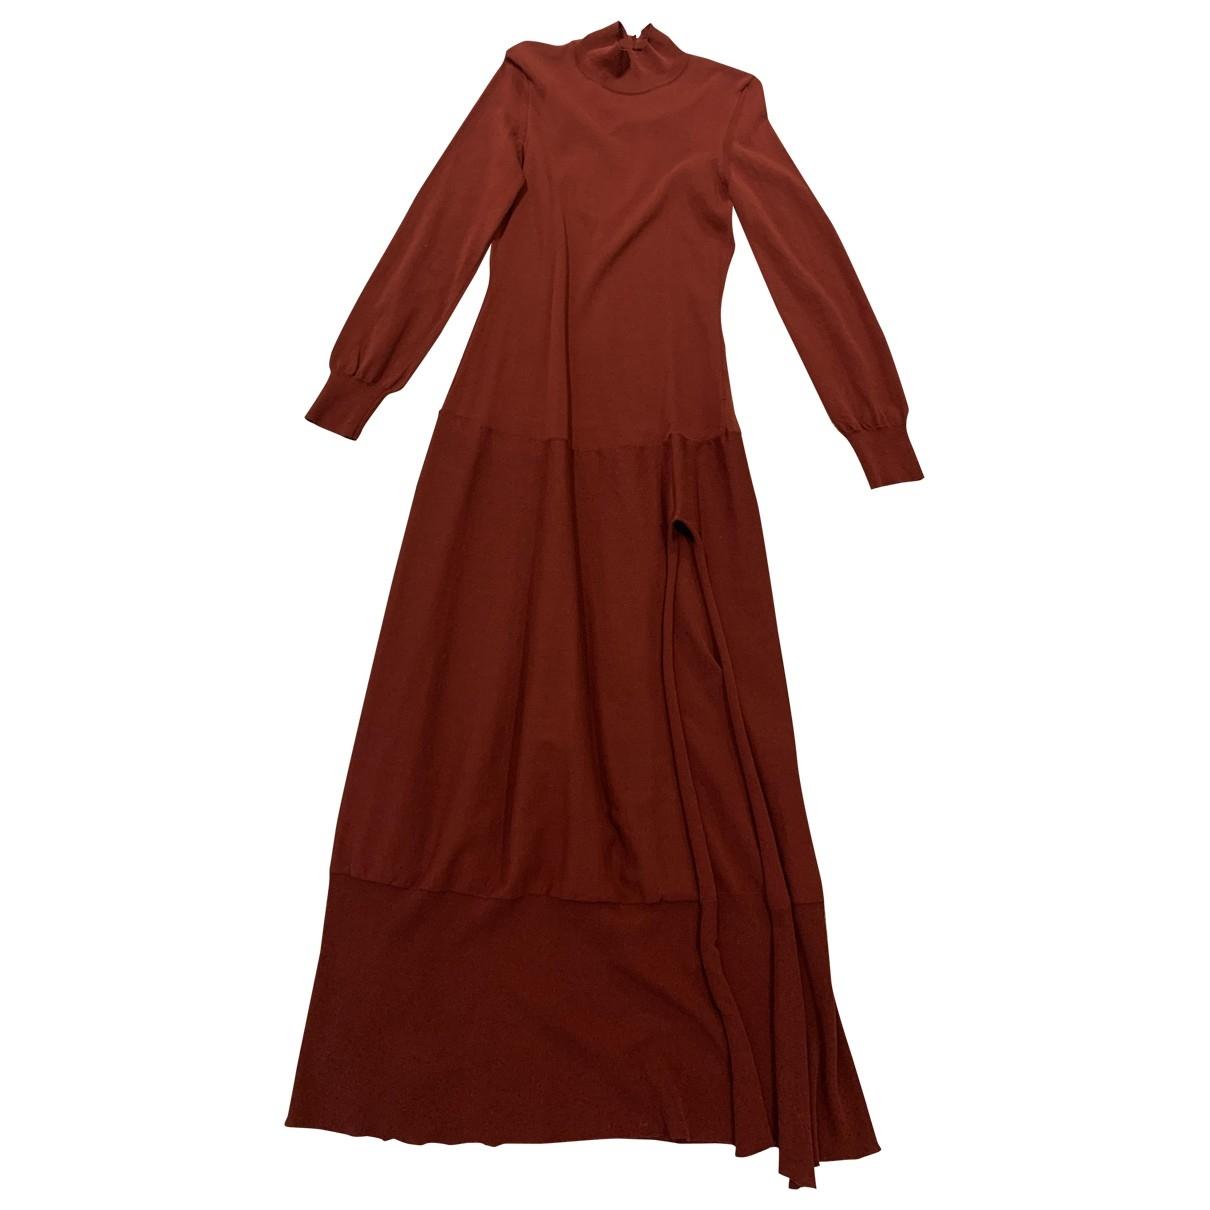 Jacquemus La Bomba Burgundy Cotton dress for Women 40 FR